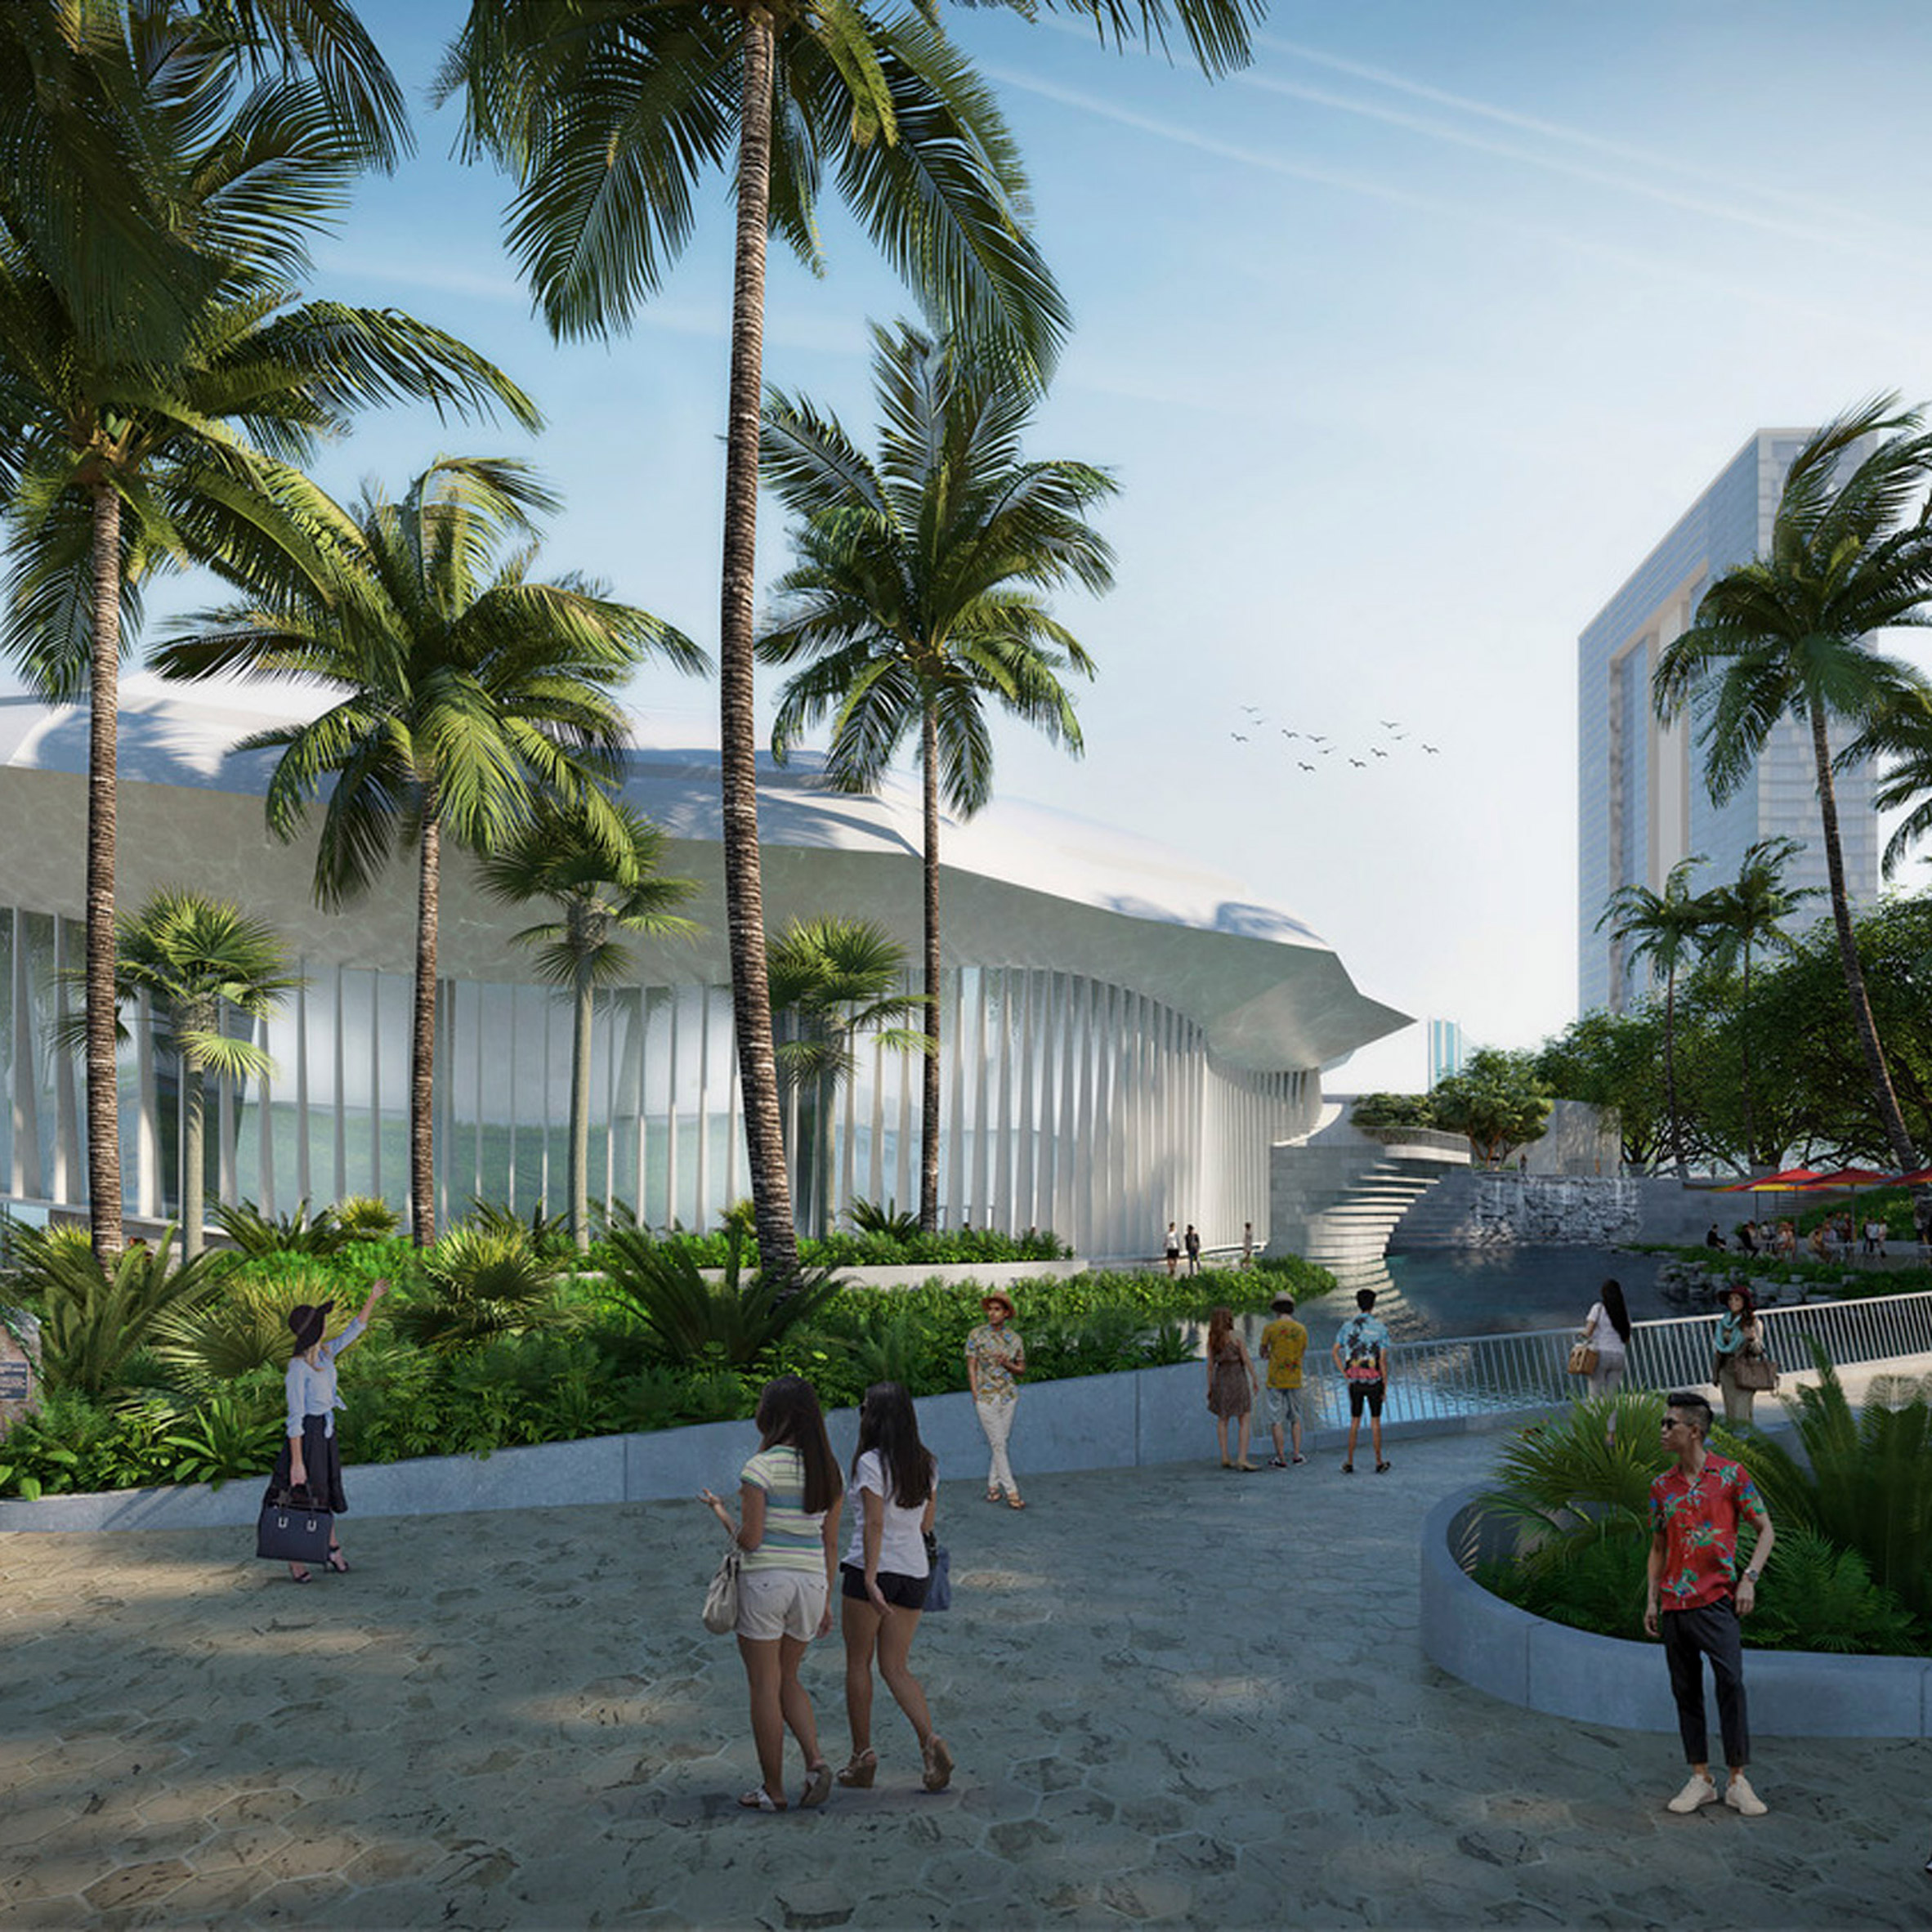 Snøhetta reveals masterplan for 1960s Blaisdell Center in